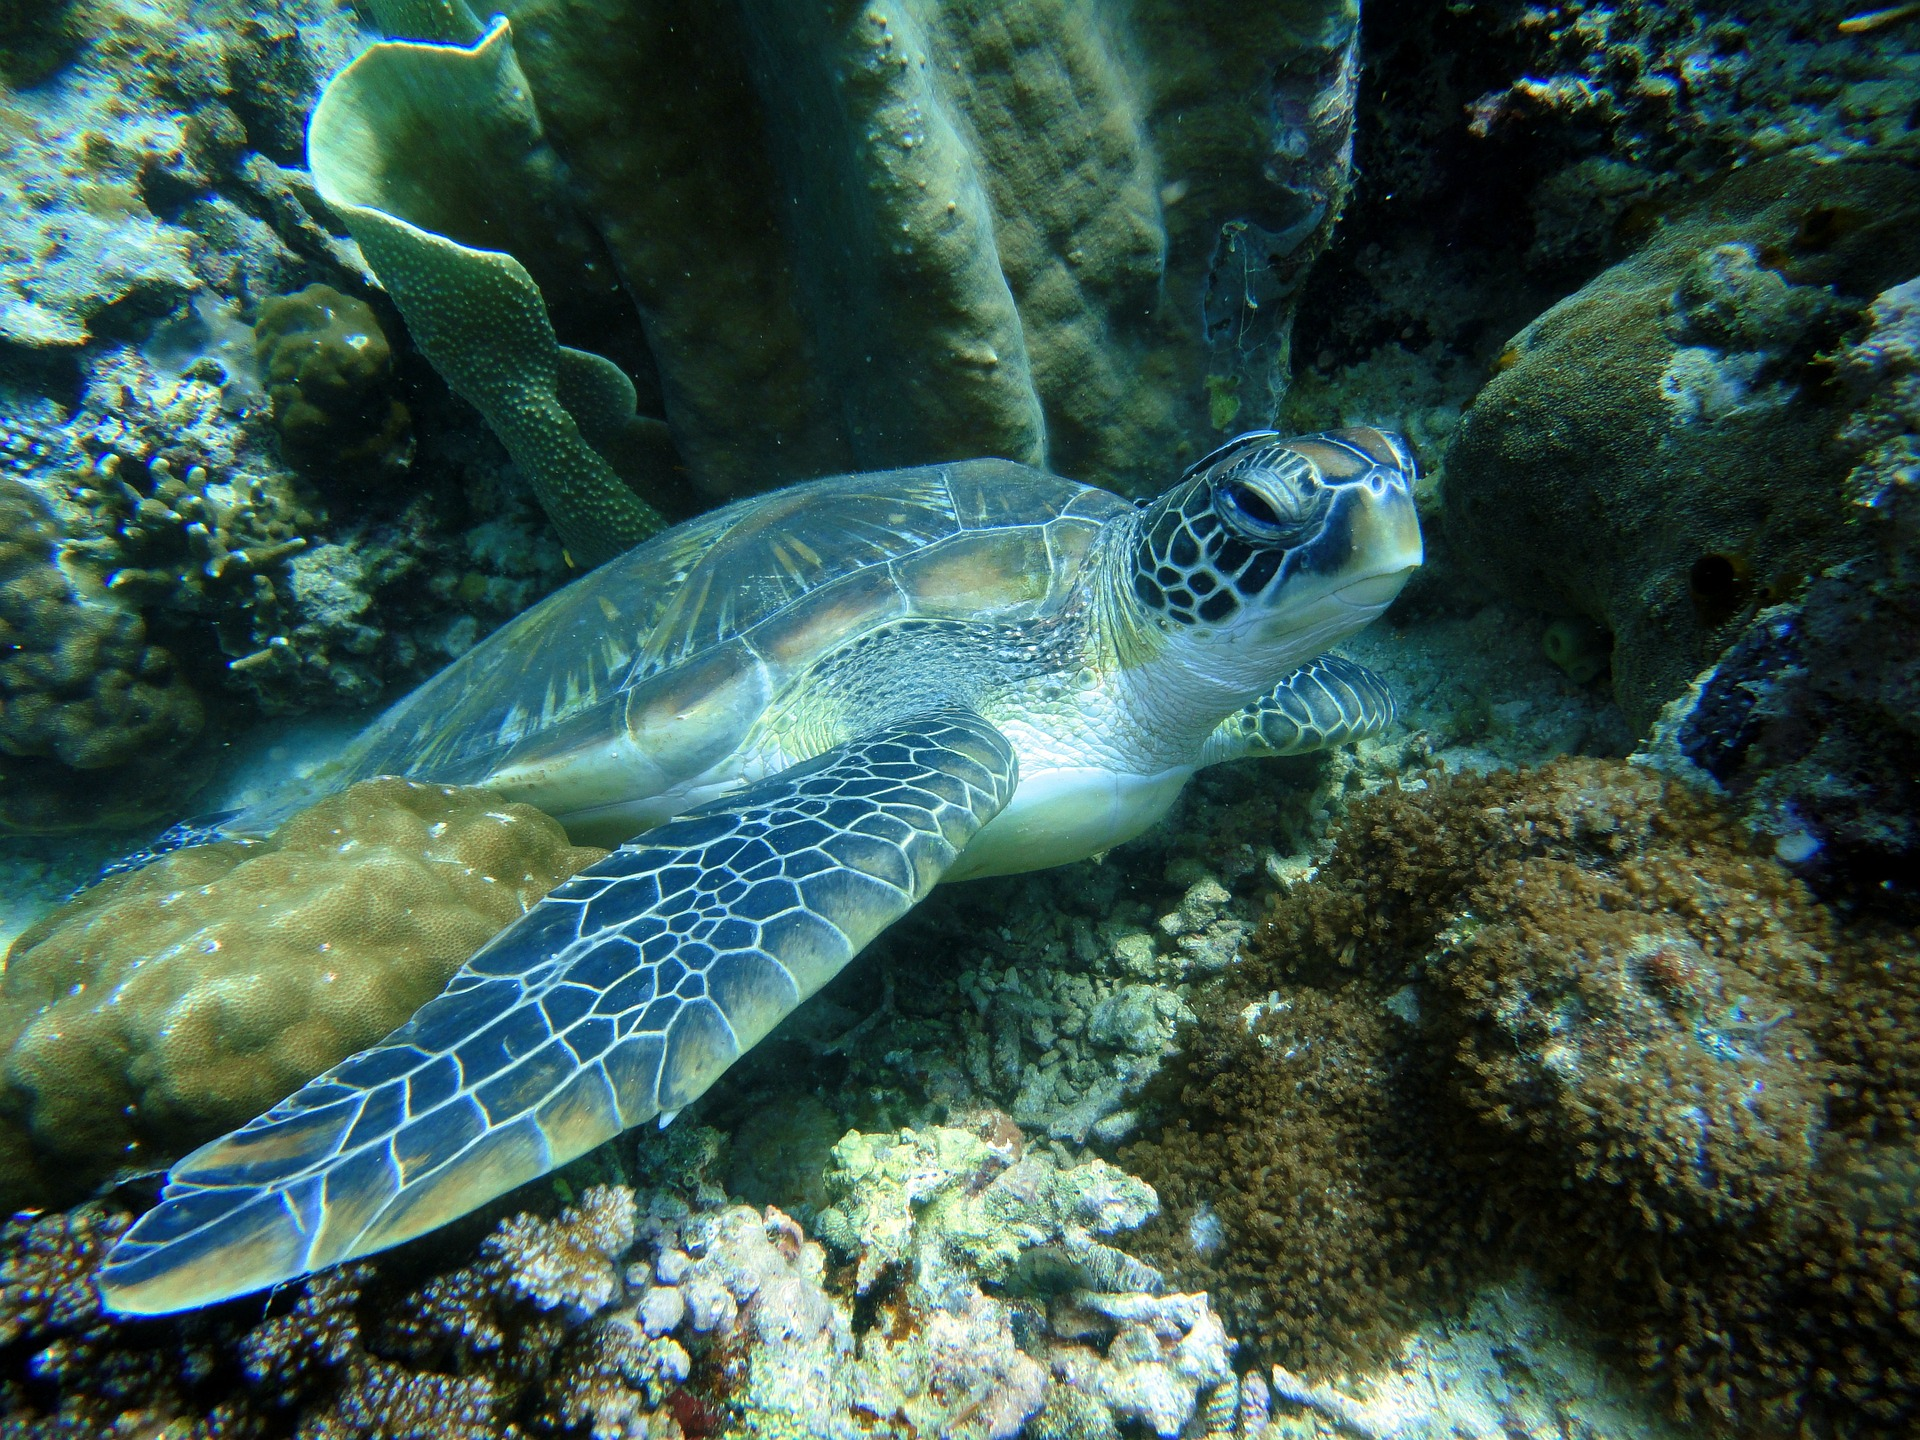 Séjour aux Philippines-Tortue marine